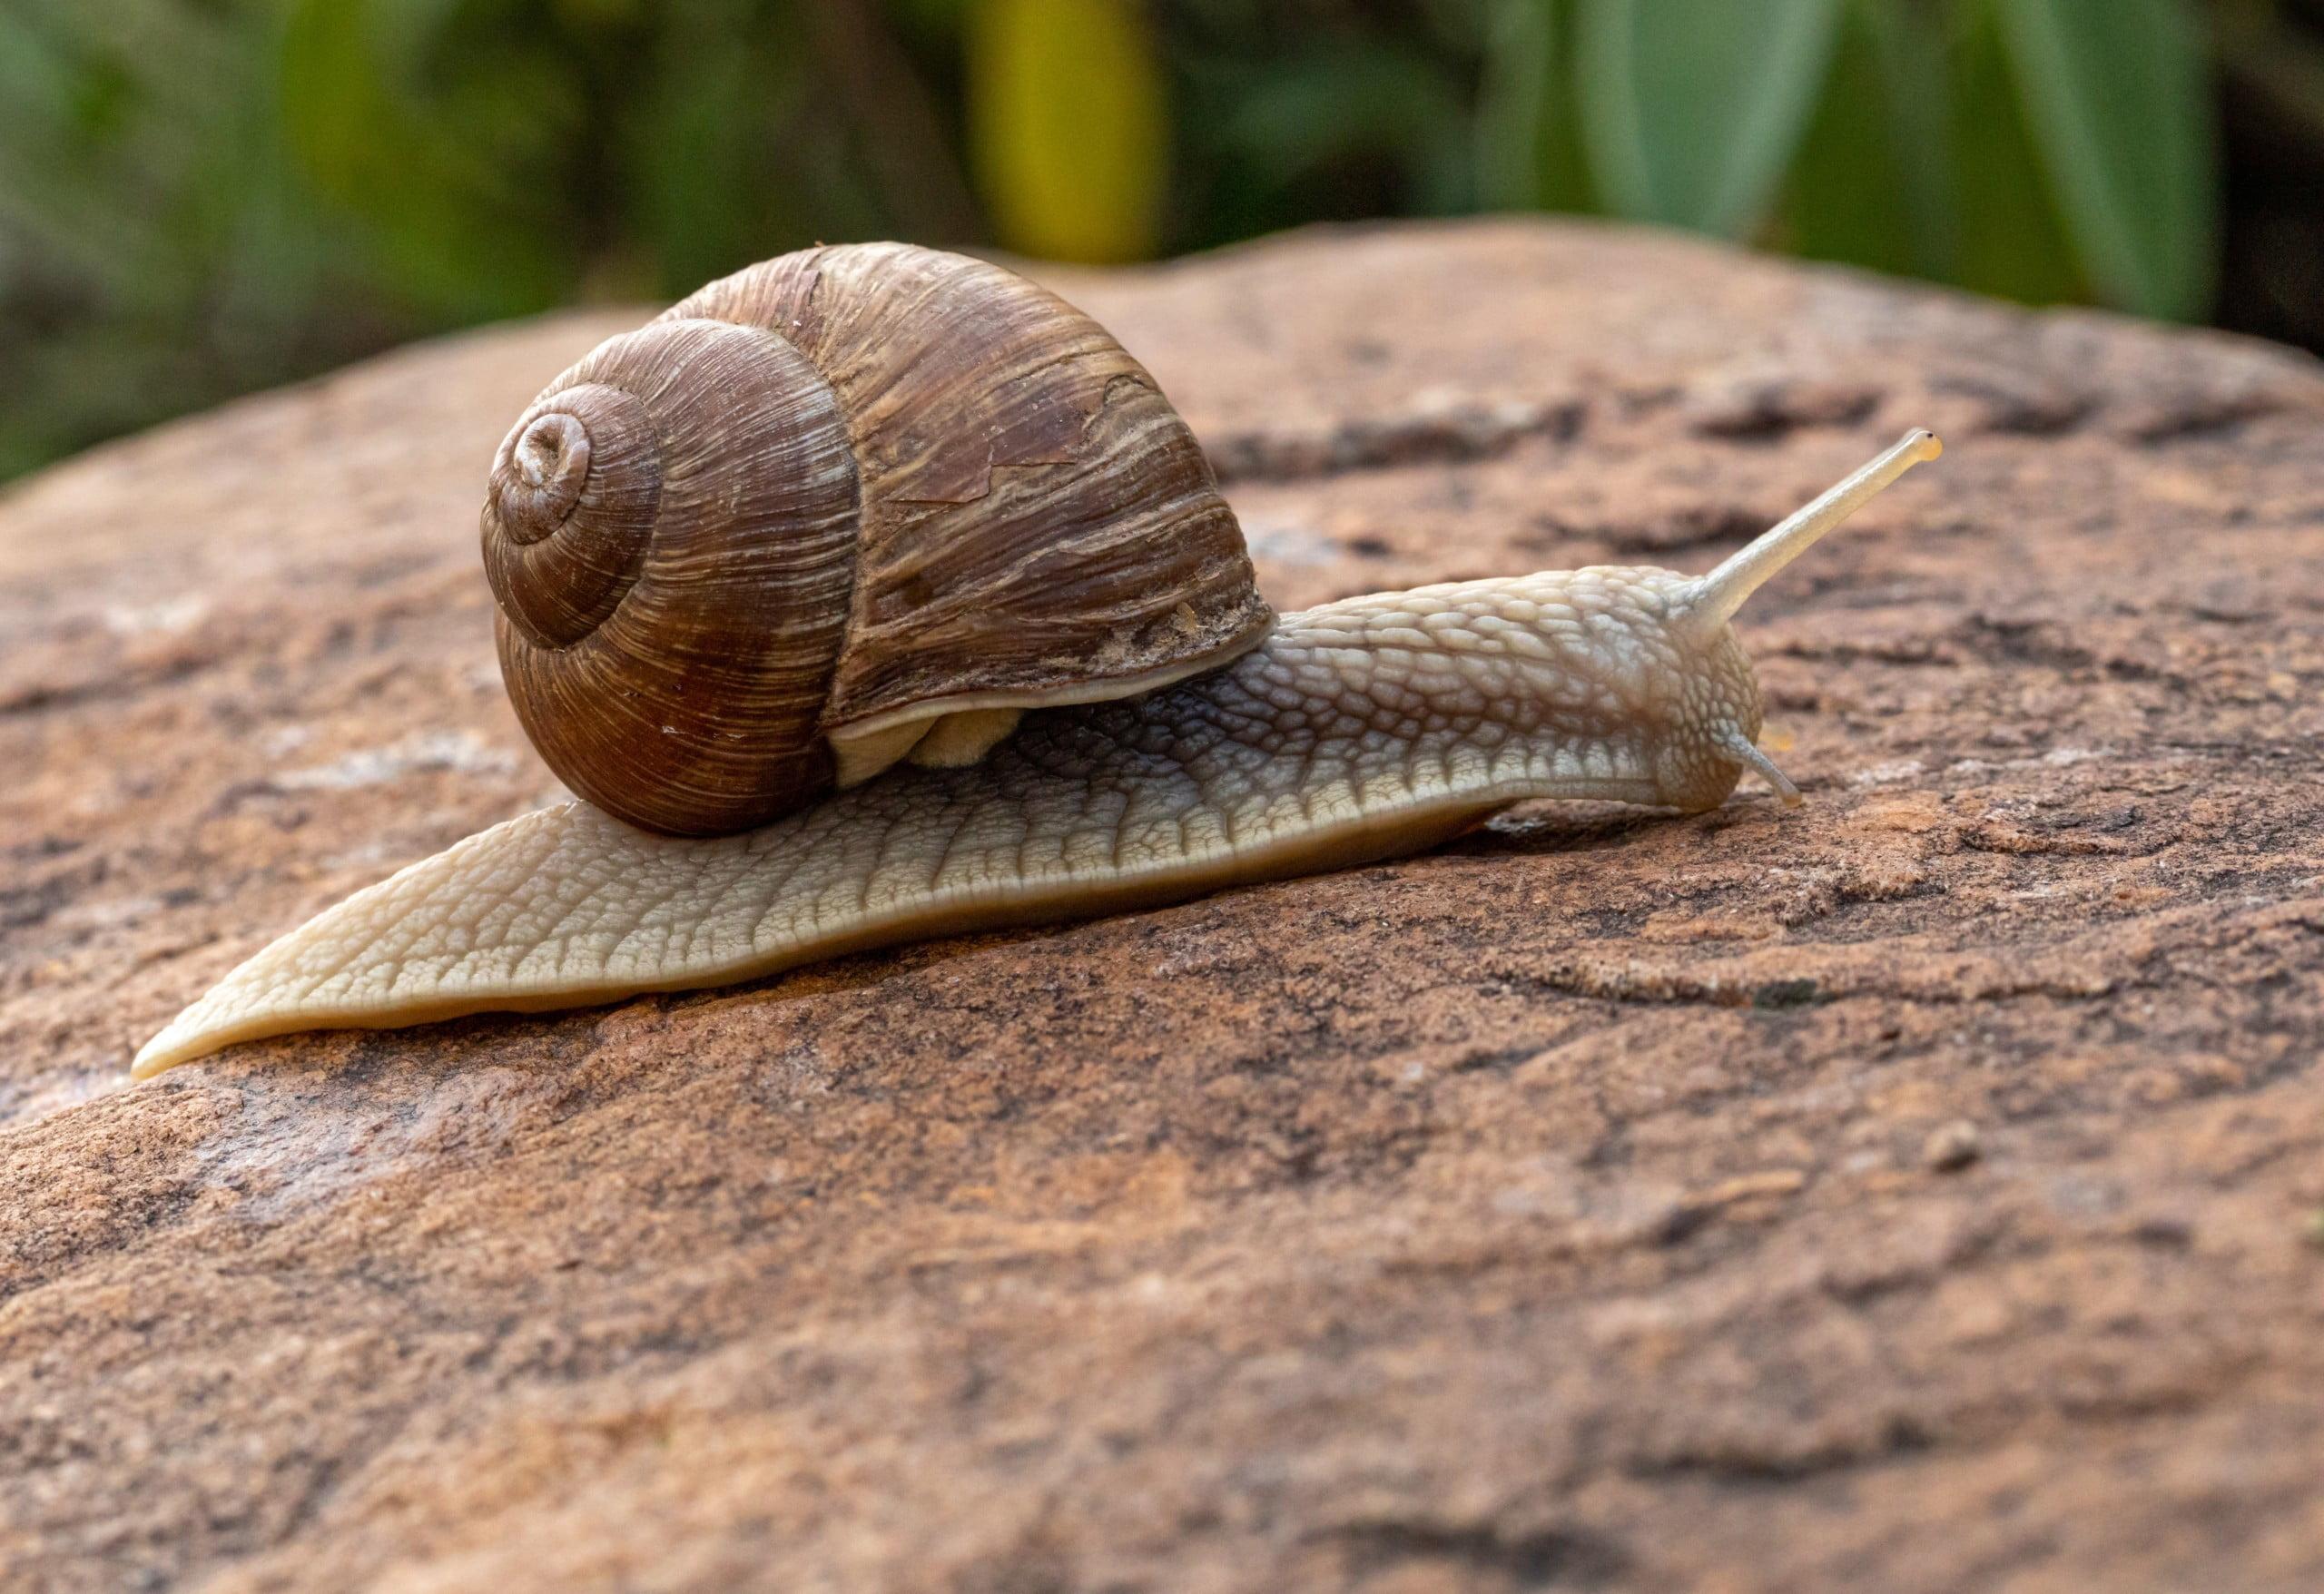 brown snail on rock